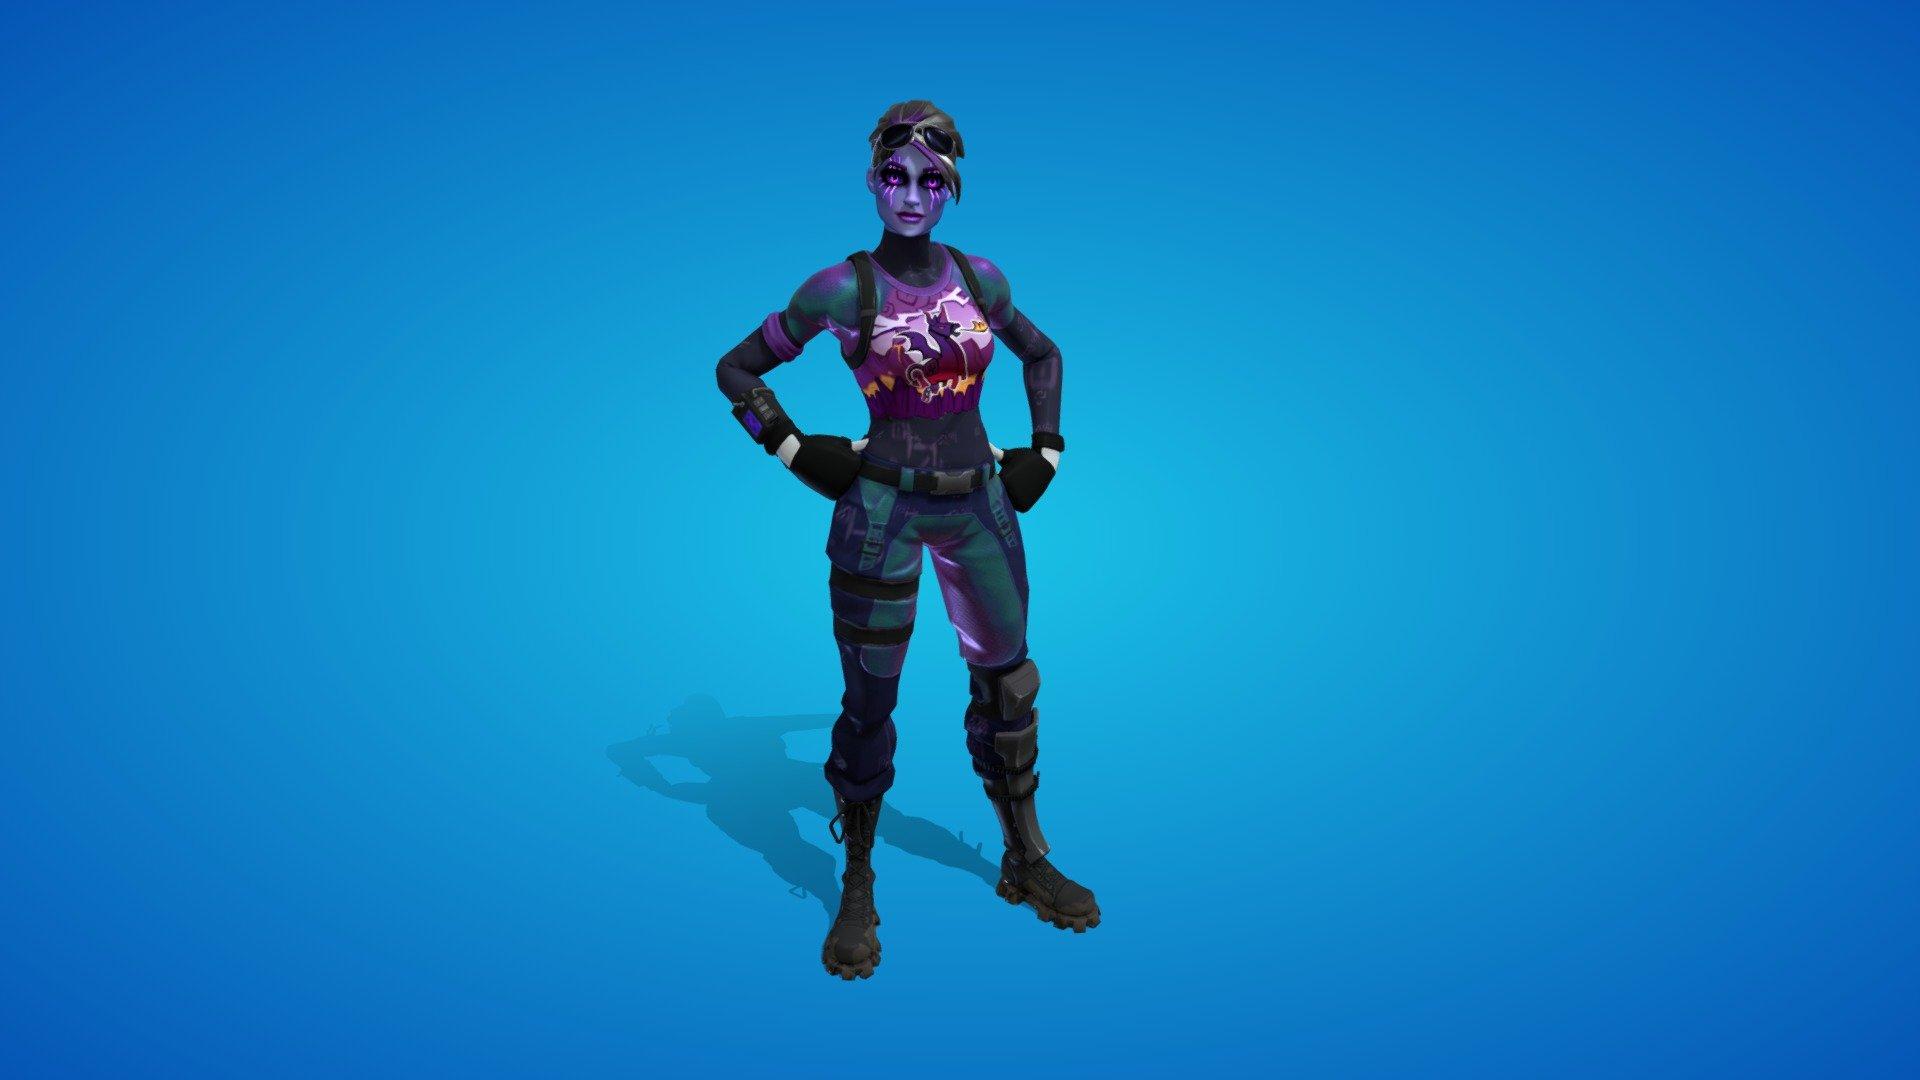 Dark Bomber Outfit 3d Model By Fortnite Skins Fortniteskins 851b6e3 Sketchfab